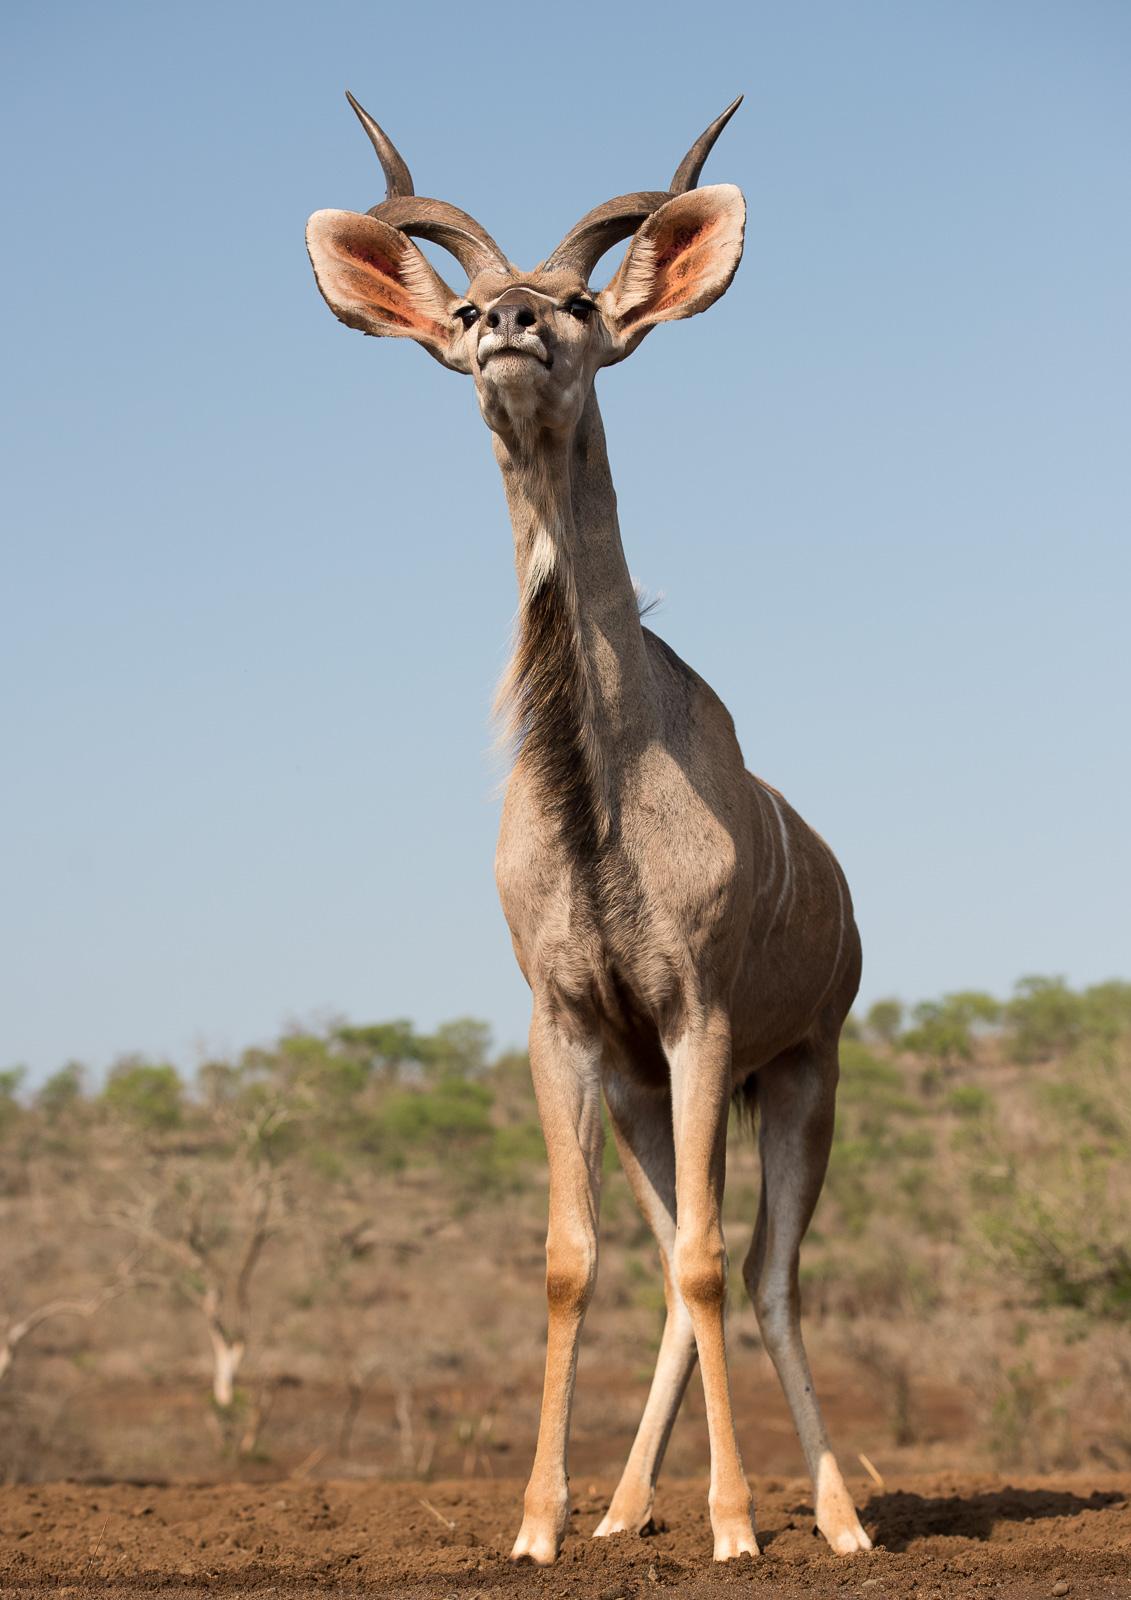 UMGODI: Male Kudu  Nikon D810 70-200mm f2.8 at 70mm. 1/1250, f5.0, ISO2000